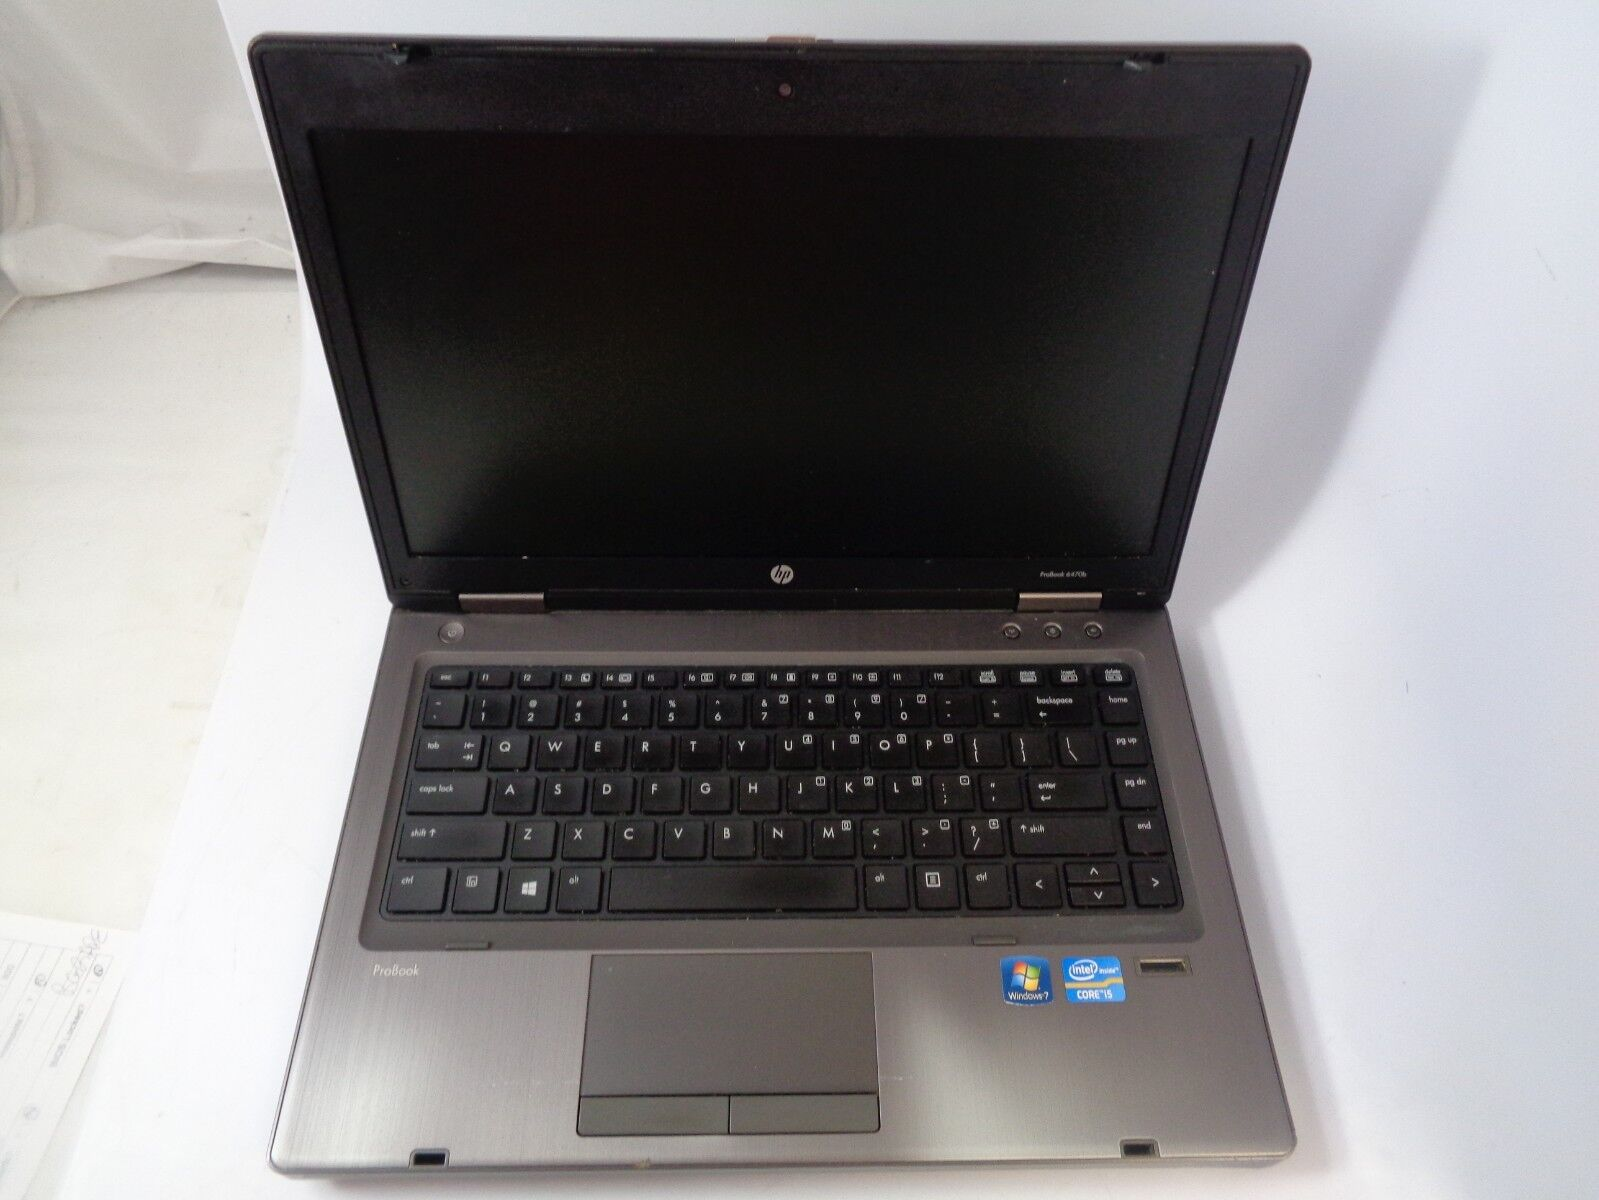 "HP ProBook 6470B 14"" i5-3340m 2.7GHz 8GB RAM 320GB HDD Windows 7 Professional"